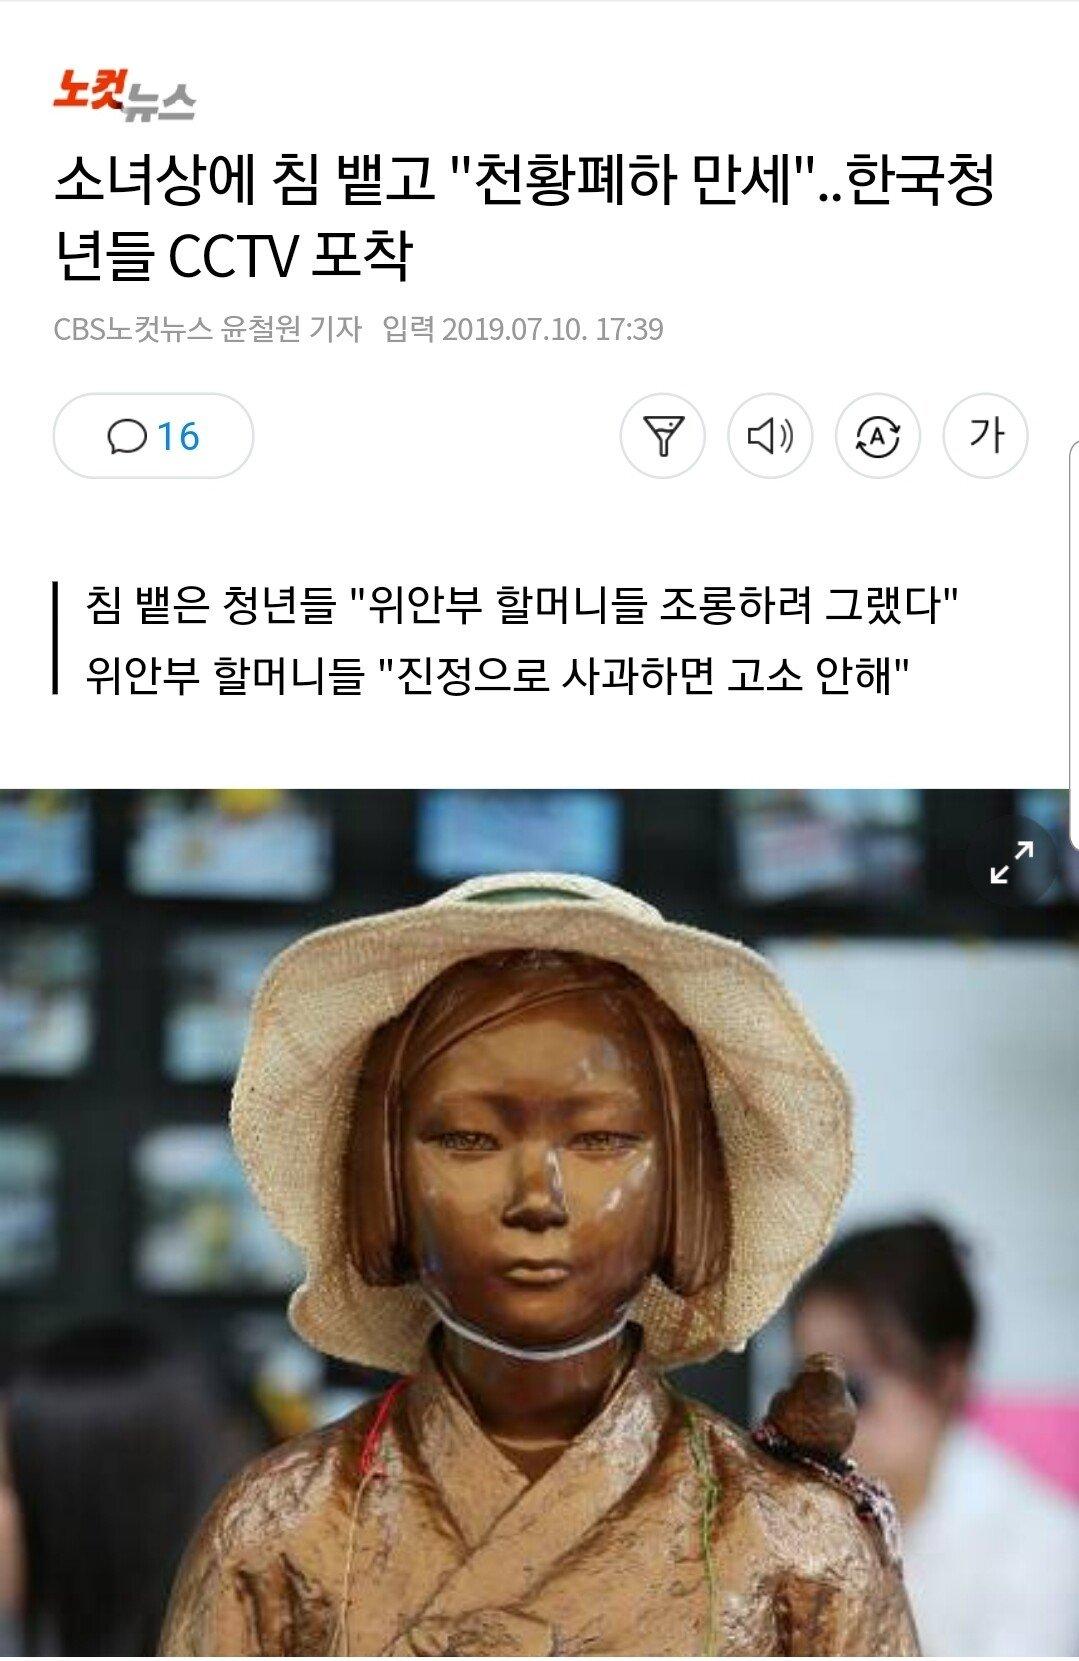 Screenshot_20190710-174849_Samsung Internet.jpg 소녀상에 침뱉은 하나베 패거리 근황 JPG